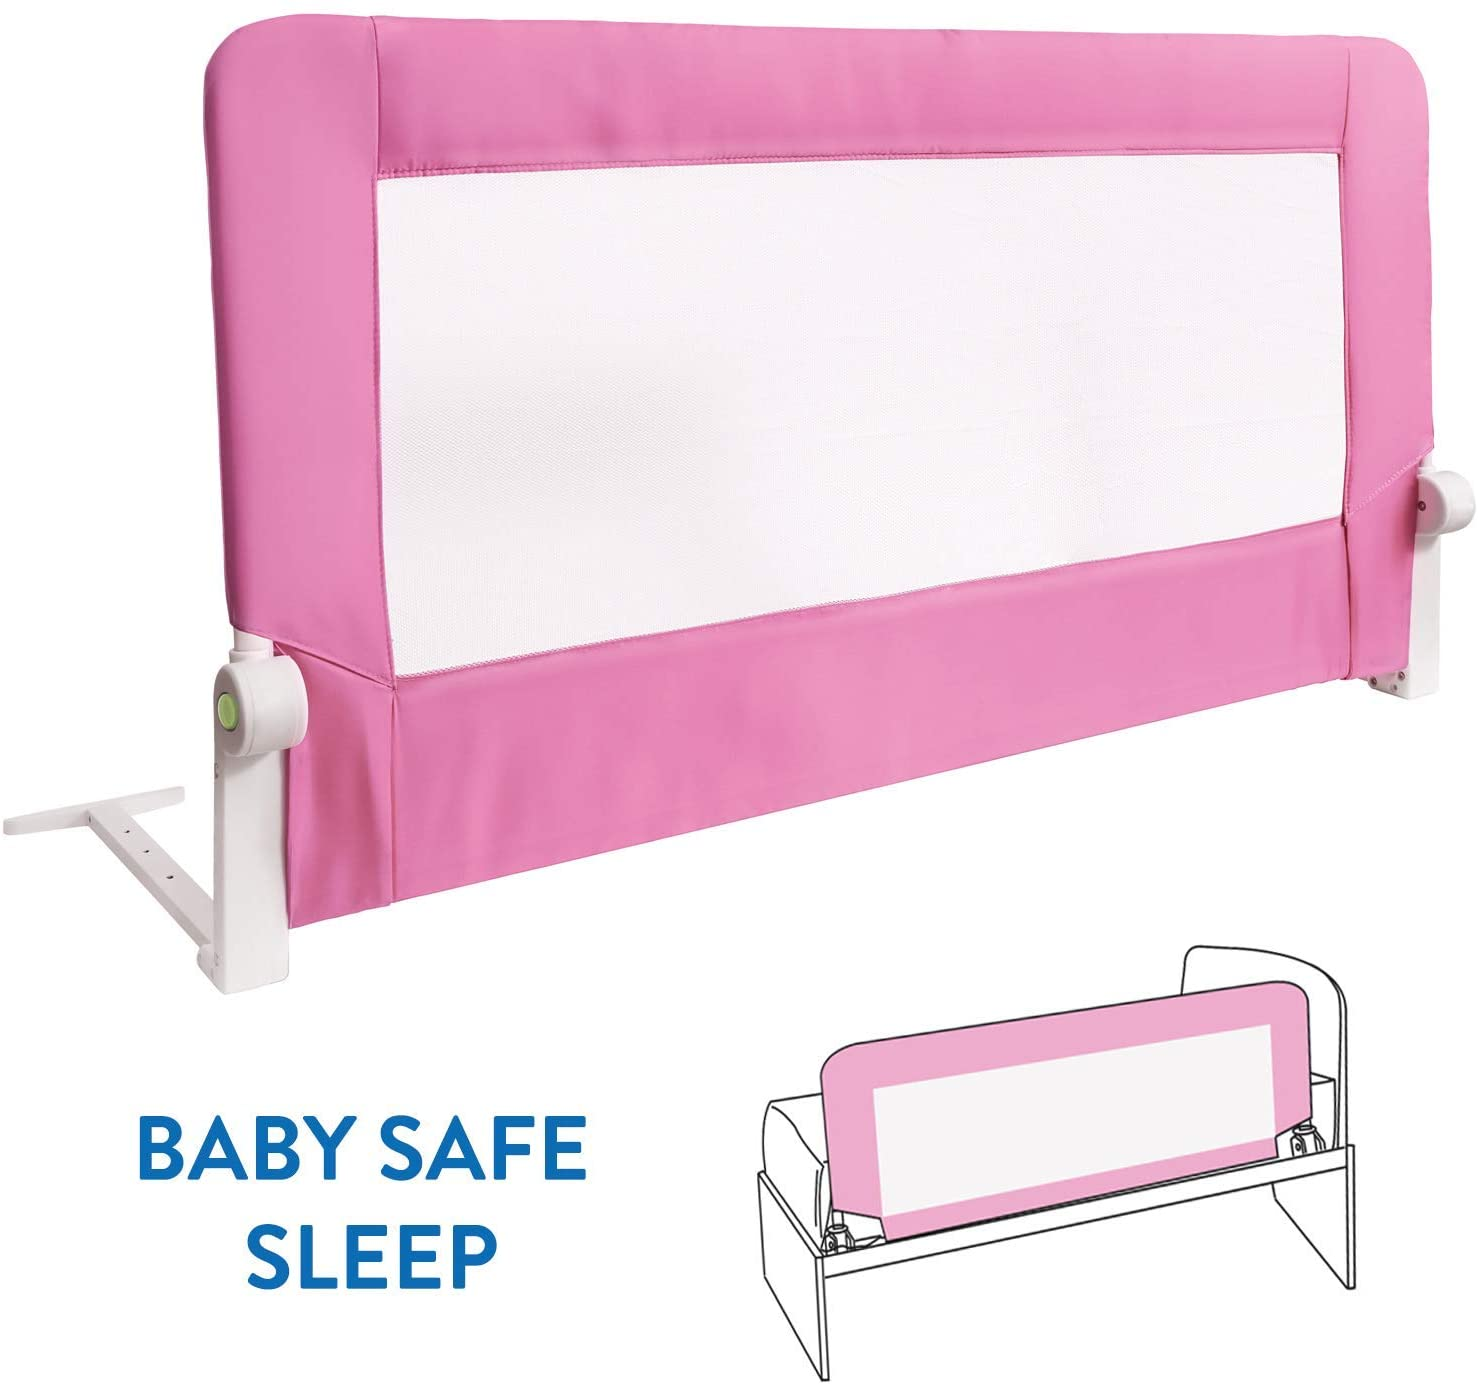 Tatkraft Guard Barandilla para Cama de Bebé Abatible Anticaidas Acero/Plástico/Poliester Rosa 120X47X65 cm